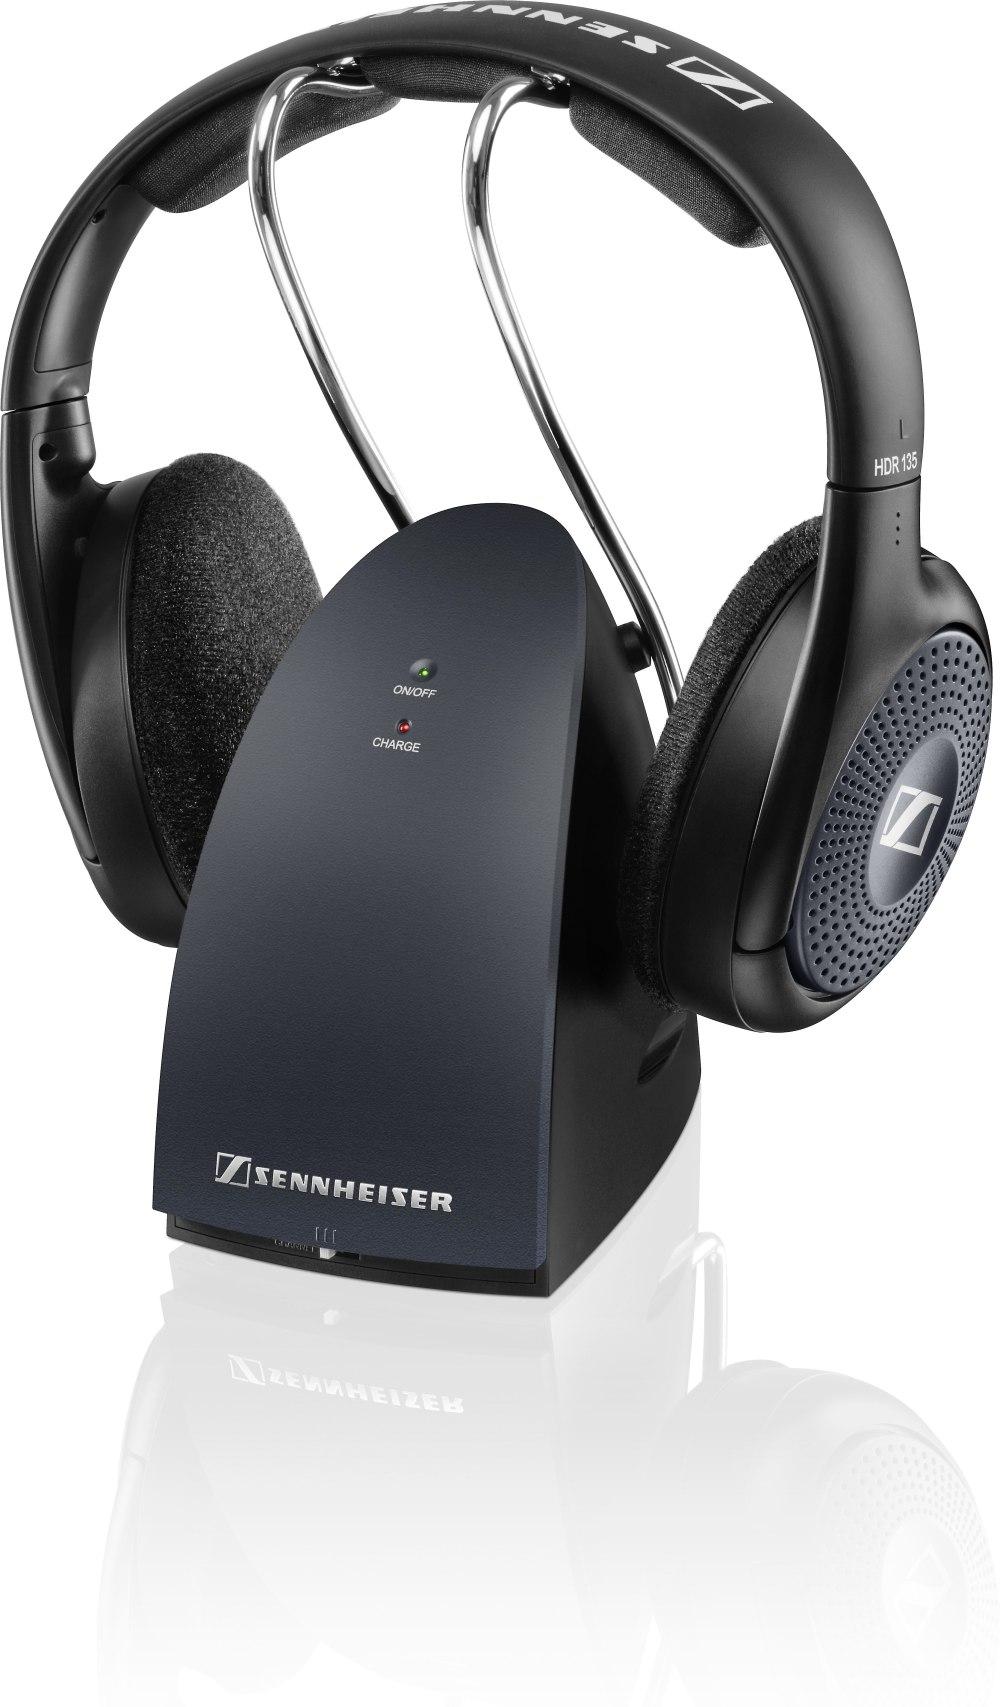 medium resolution of sennheiser rs 135 9 wireless on ear headphones with transmitter at crutchfield